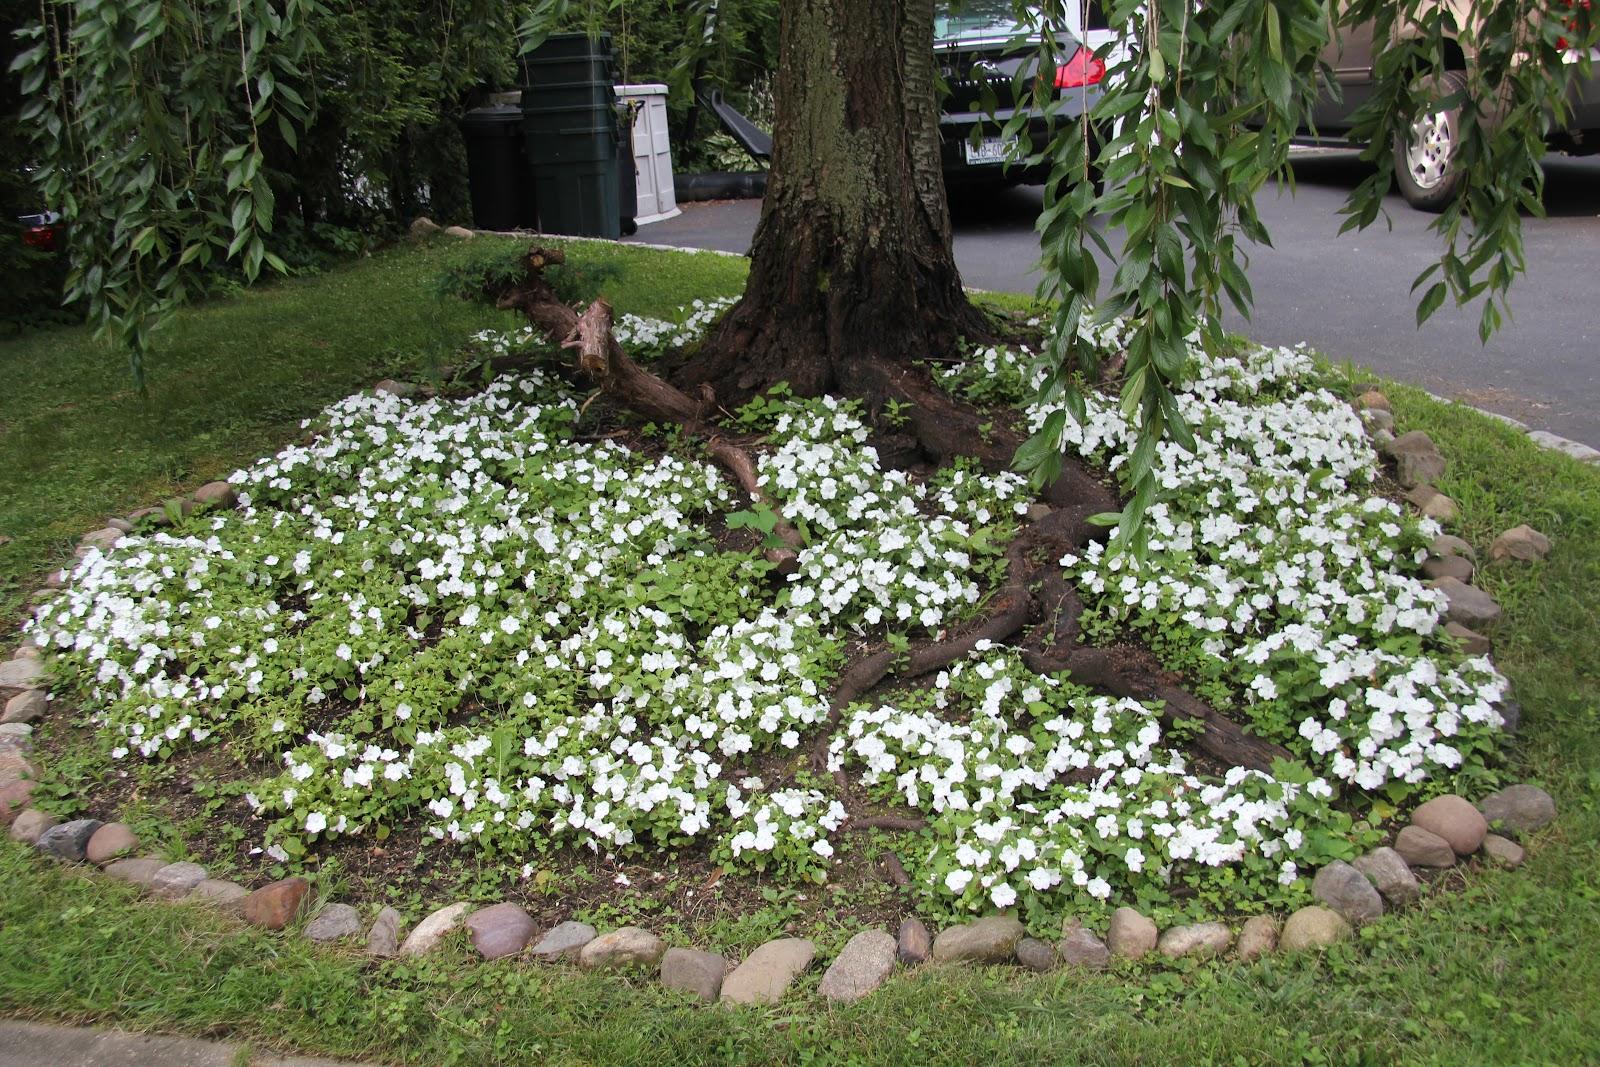 Flower Garden Ideas For Around Trees delighful flower garden ideas for around trees large tree this